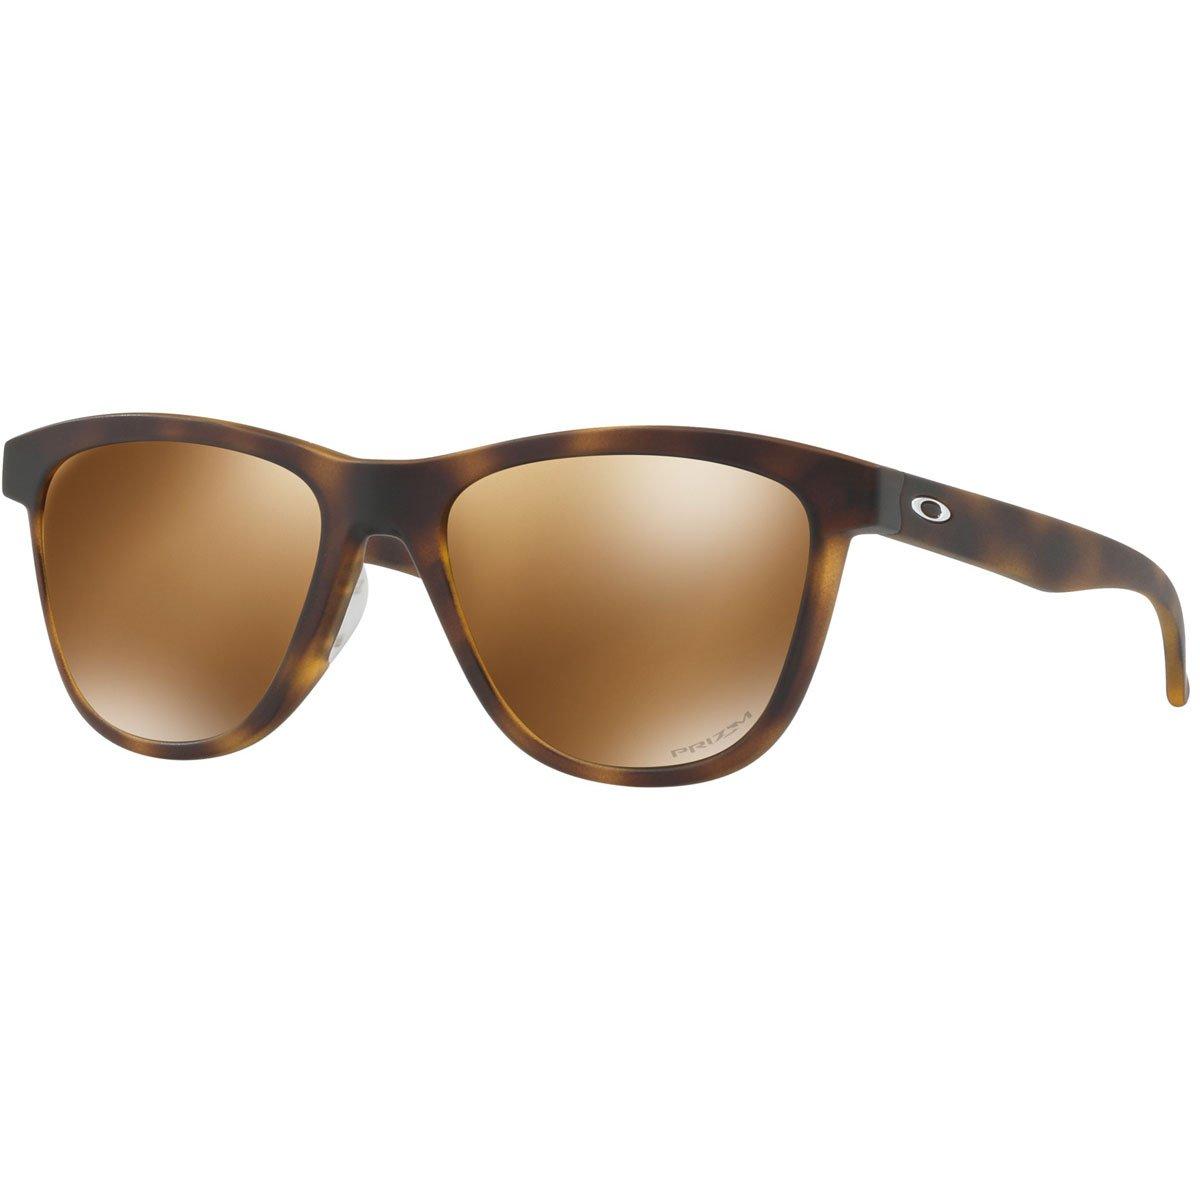 Oakley Women's Moonlighter Sunglasses, Matte Tortoise/Przm Tungsten Pol,OS